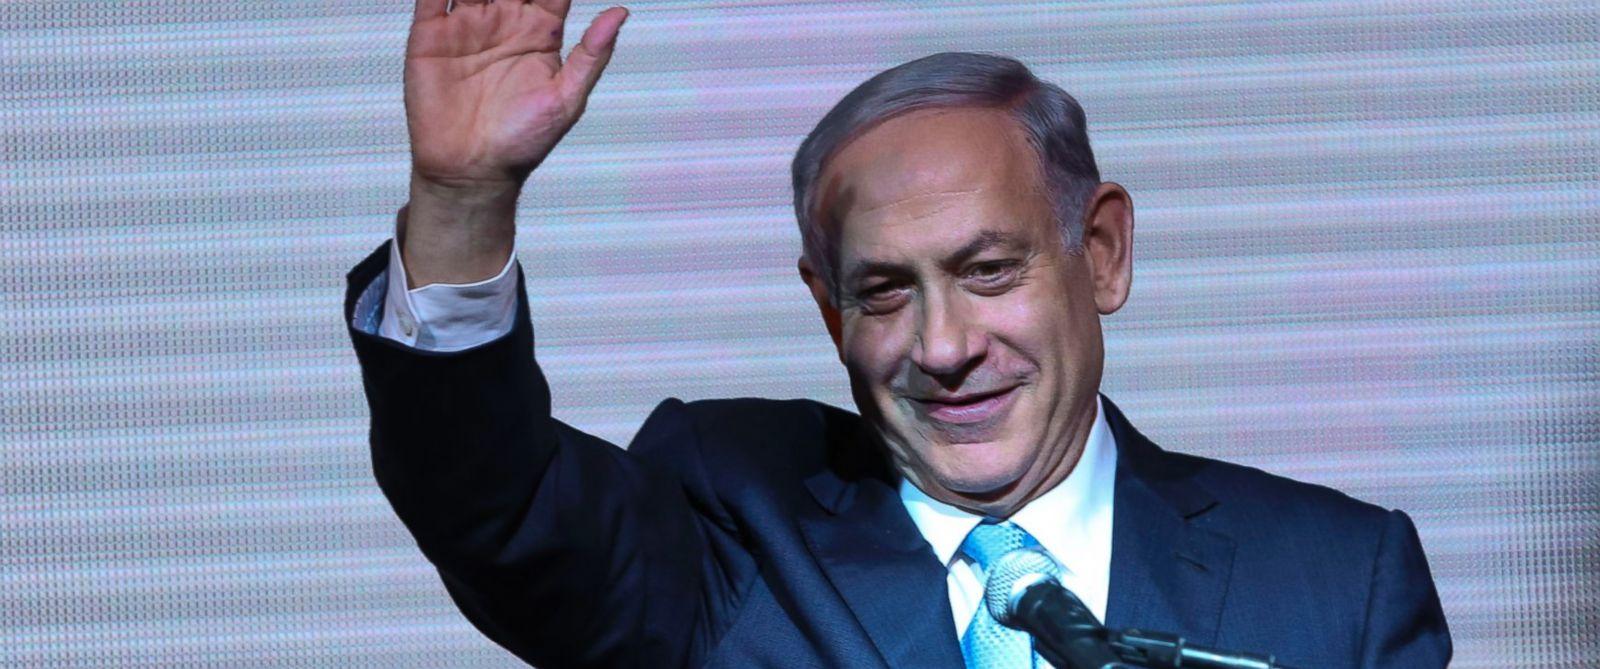 PHOTO: Israeli Prime Minister Benjamin Netanyahu greets supporters